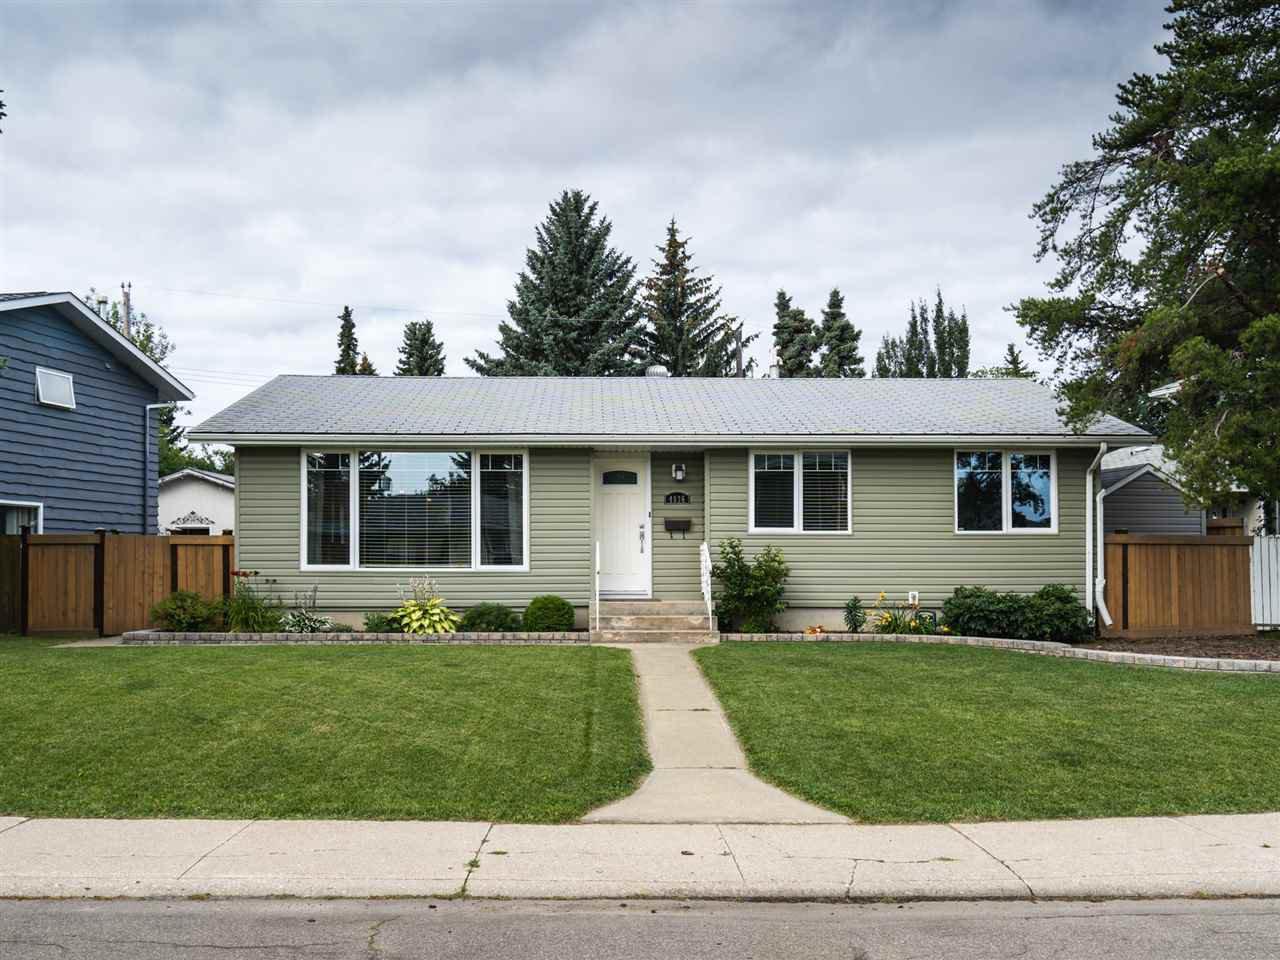 Main Photo: 4036 120 Street in Edmonton: Zone 16 House for sale : MLS®# E4170586